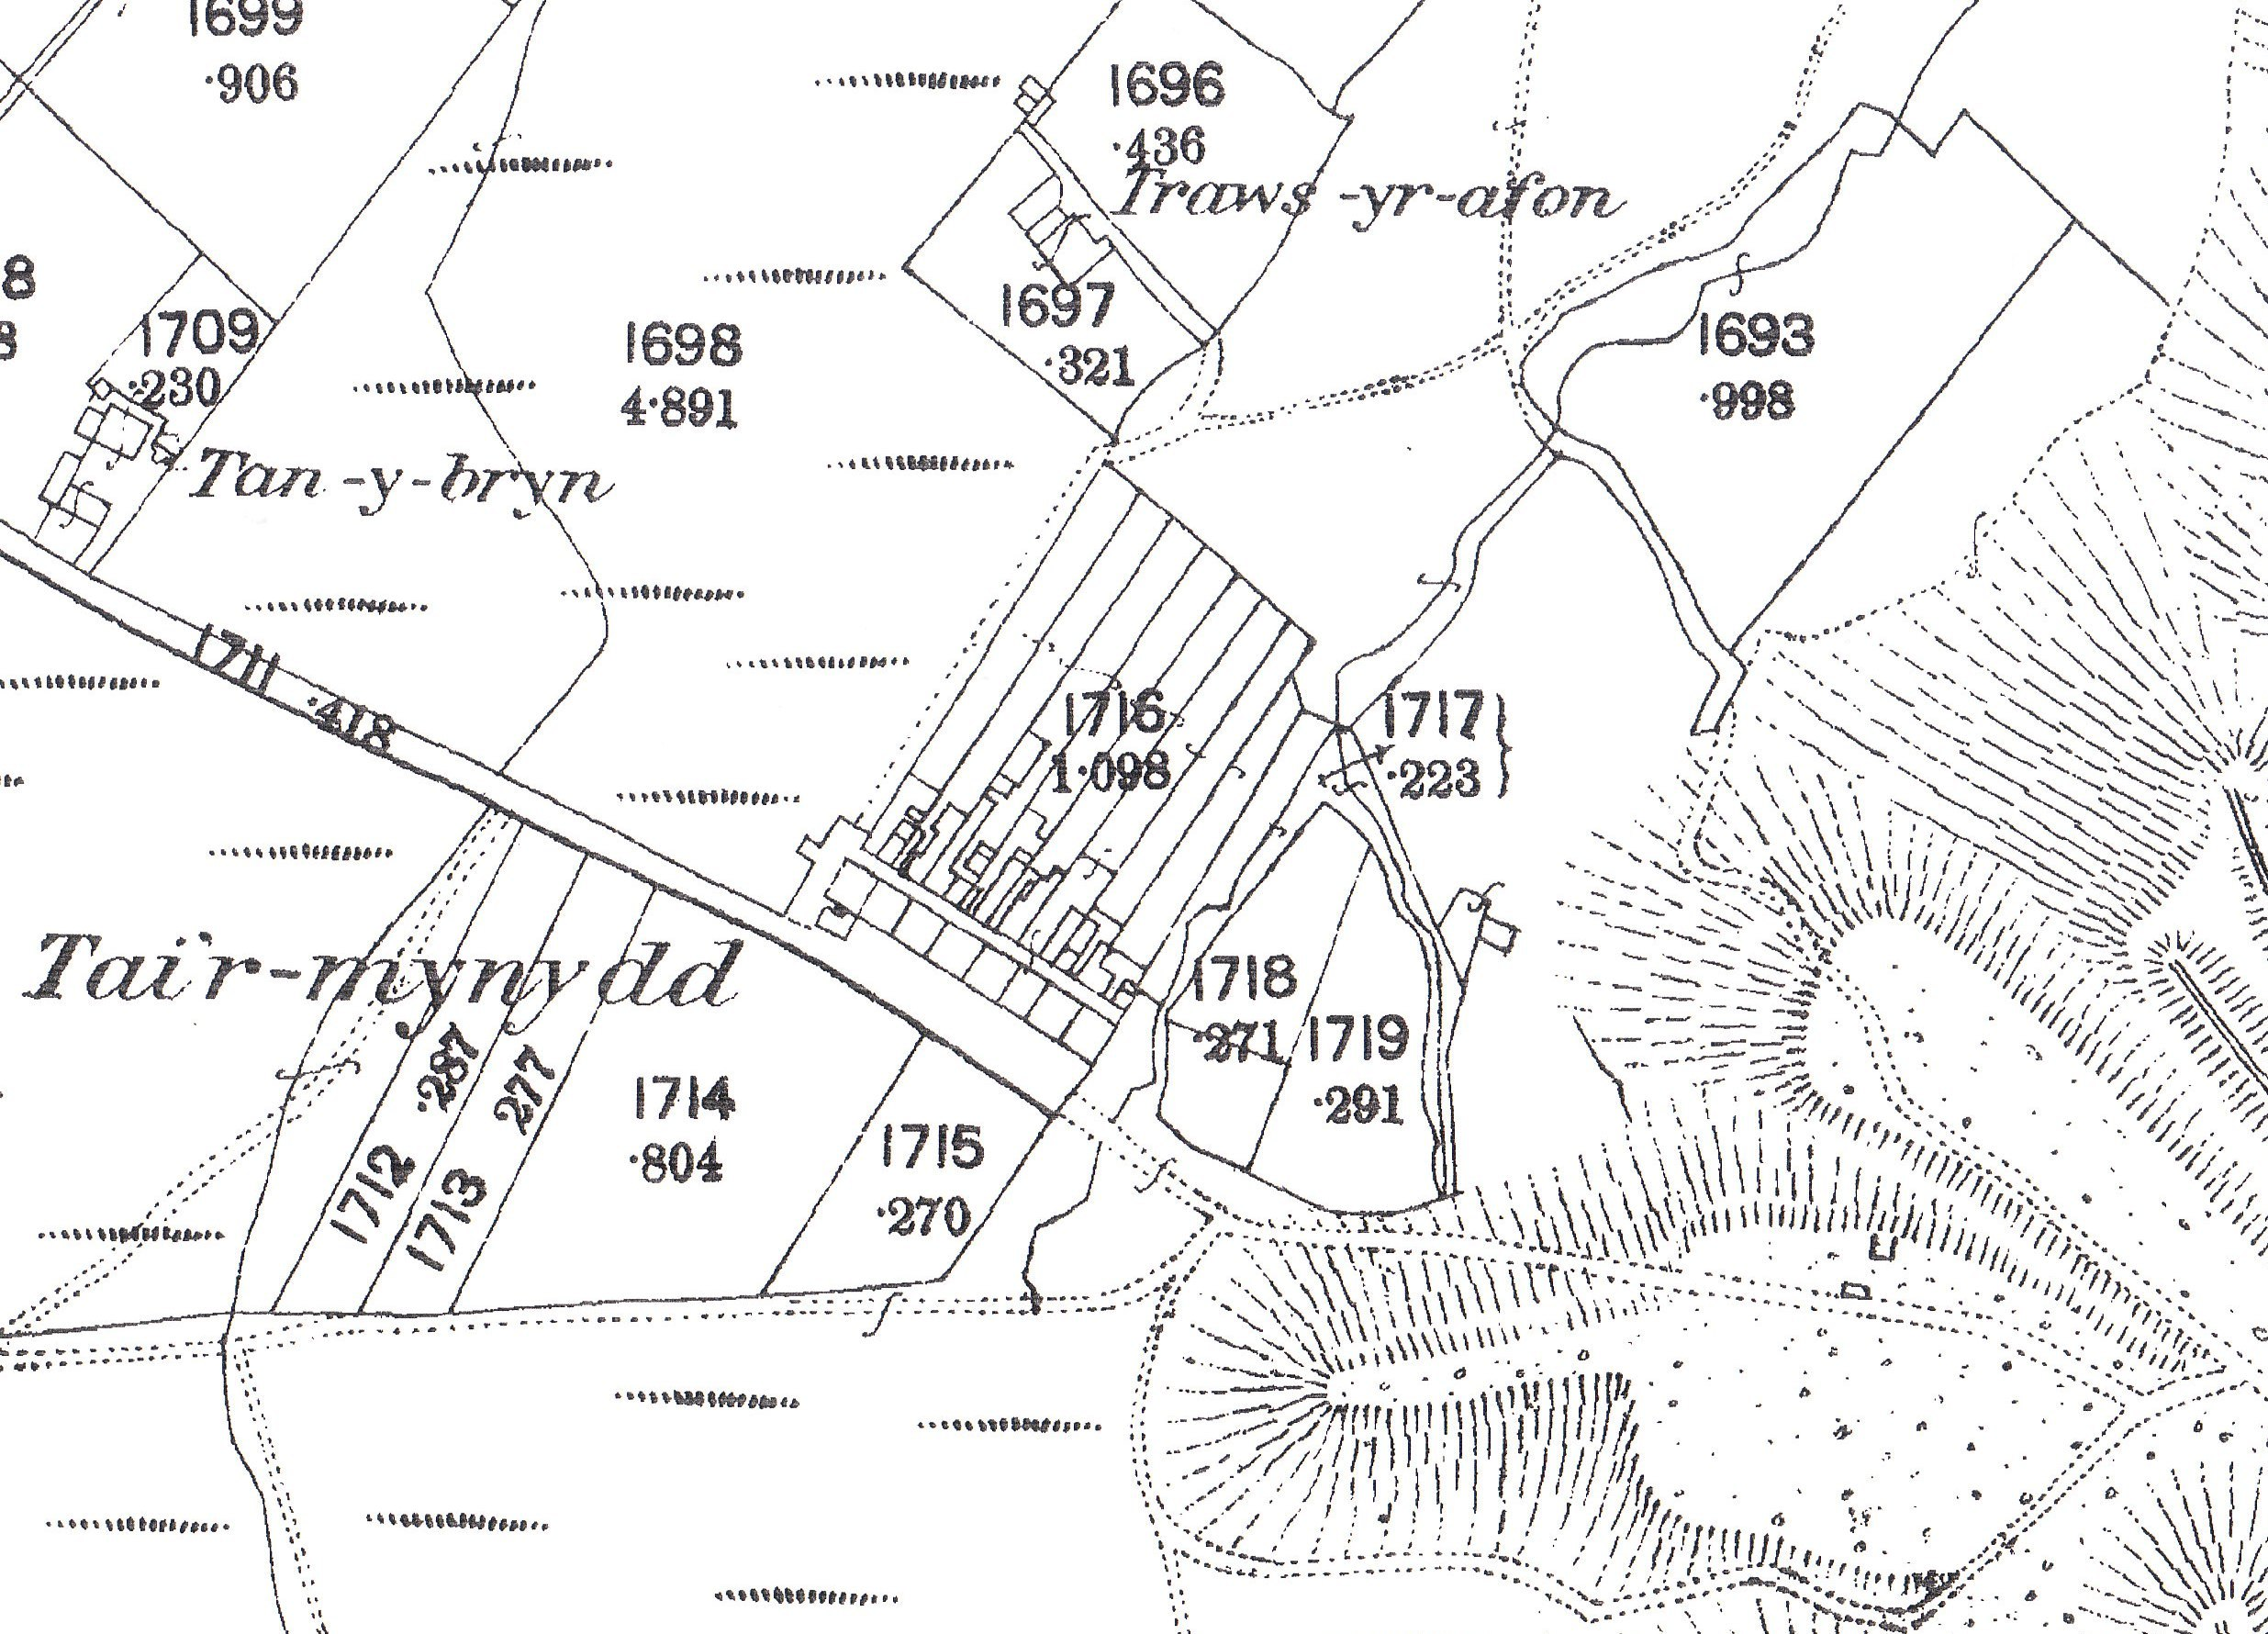 tai'r mynydd 1889 a